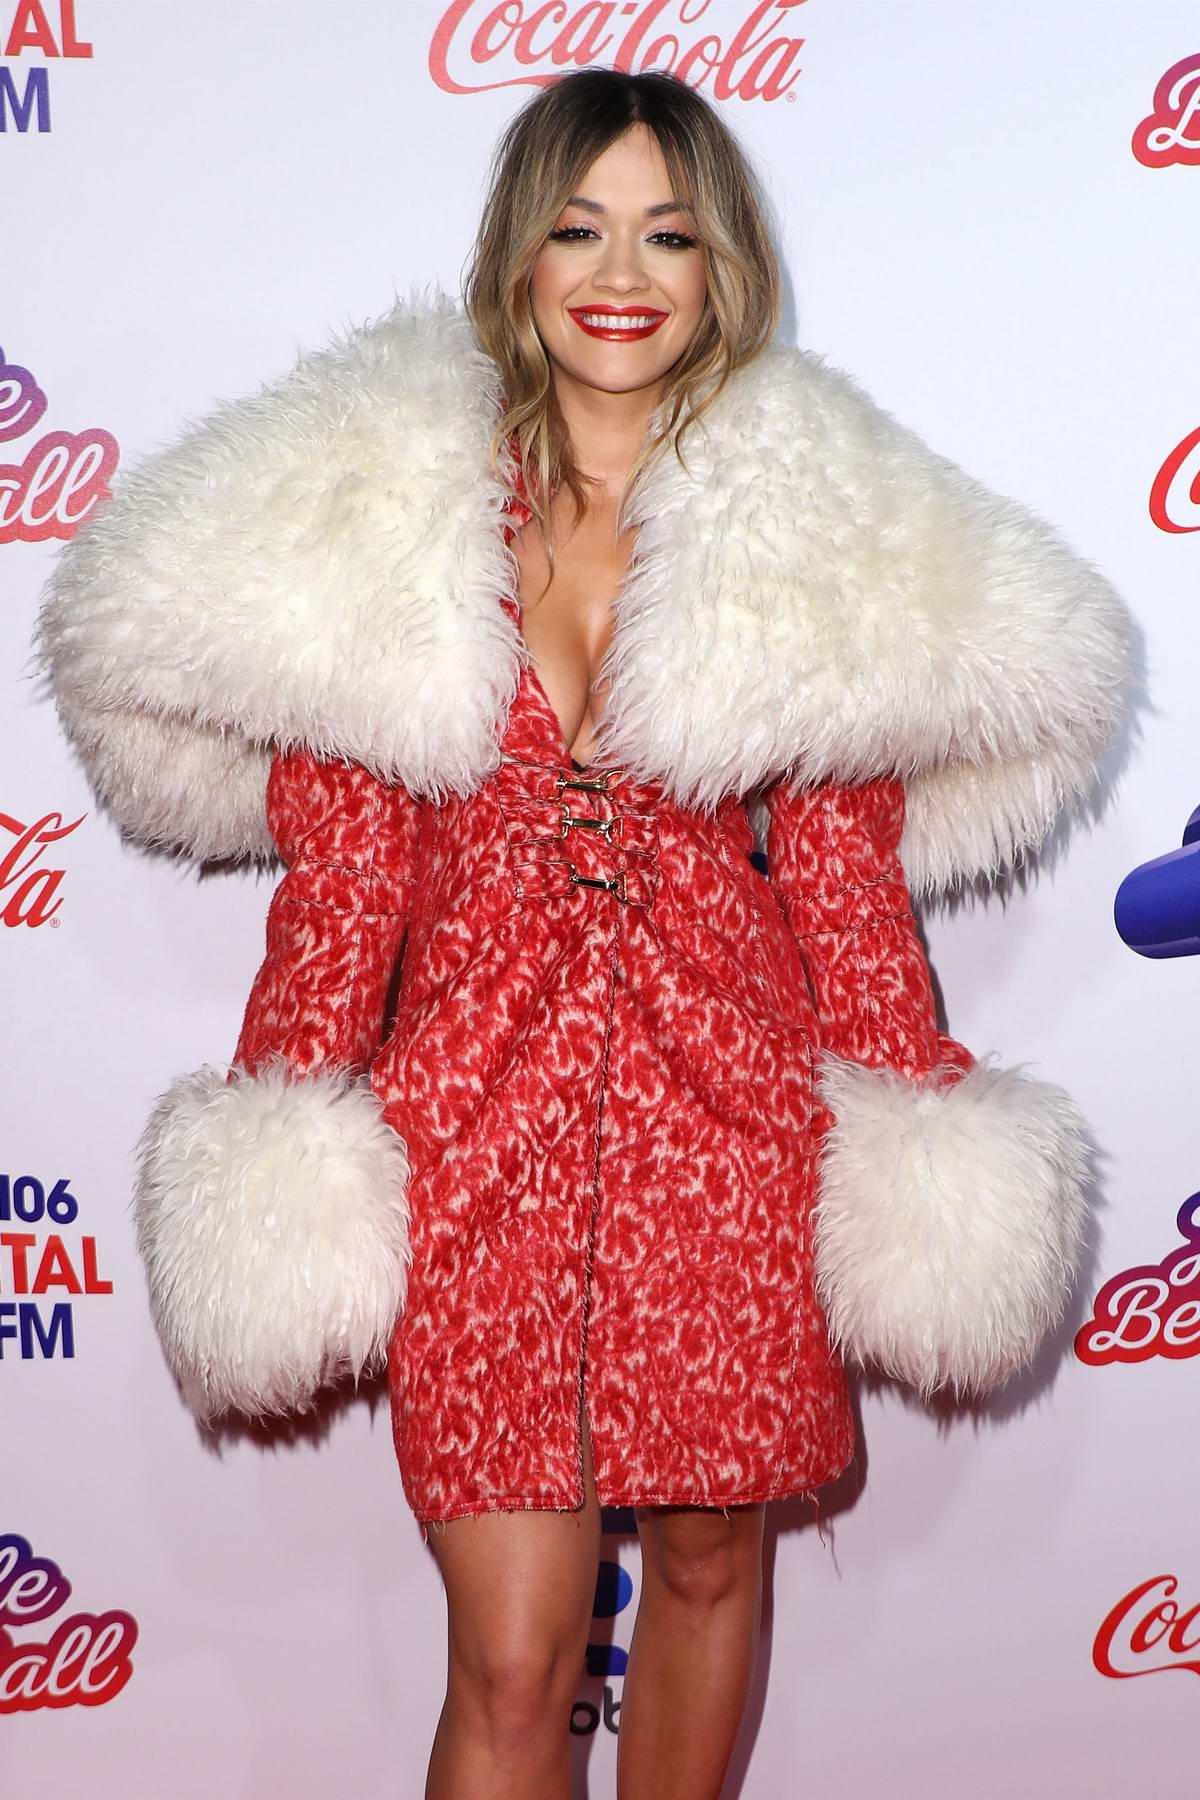 Rita Ora at Capital's Jingle Bell Ball at the O2 Arena in London